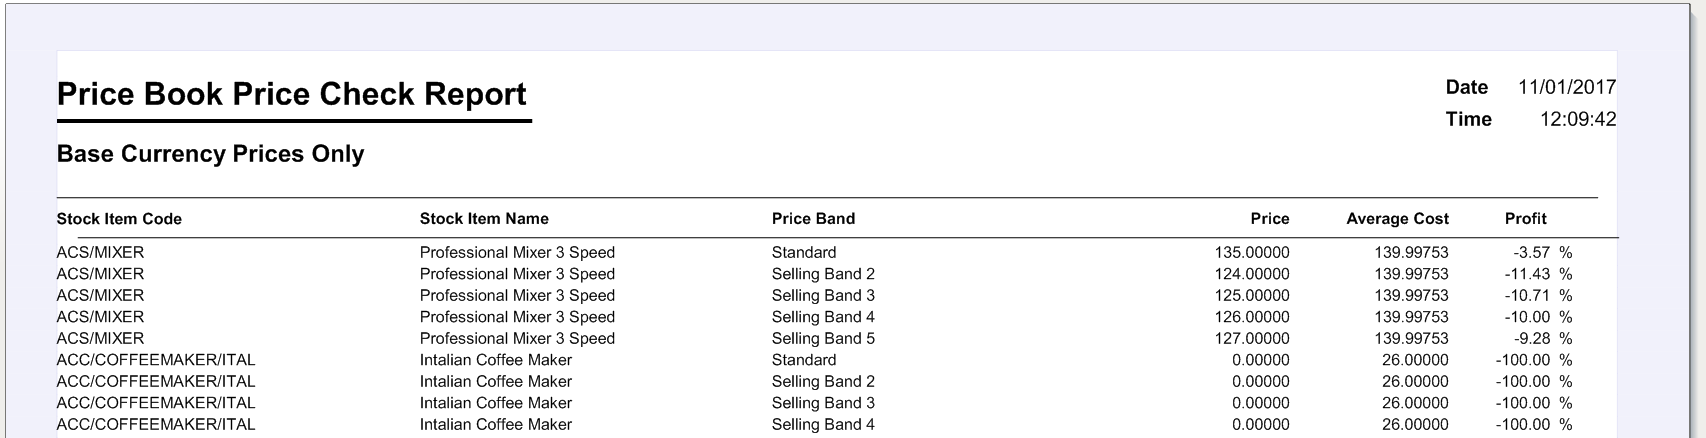 Price Book Validation